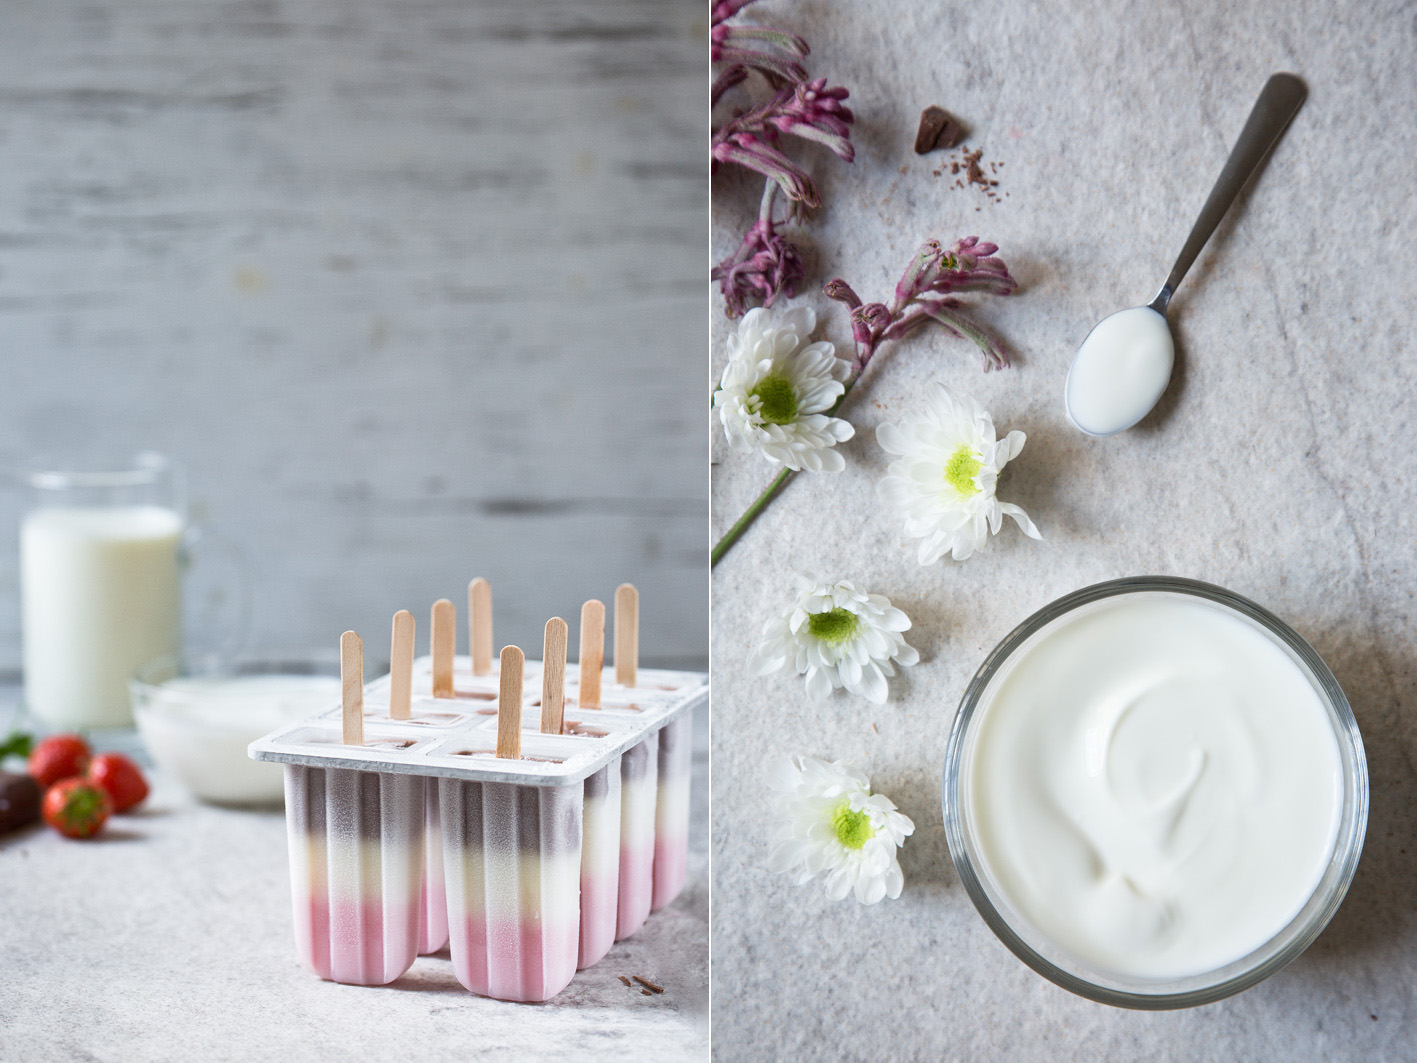 Joghurt Eis am Stiel